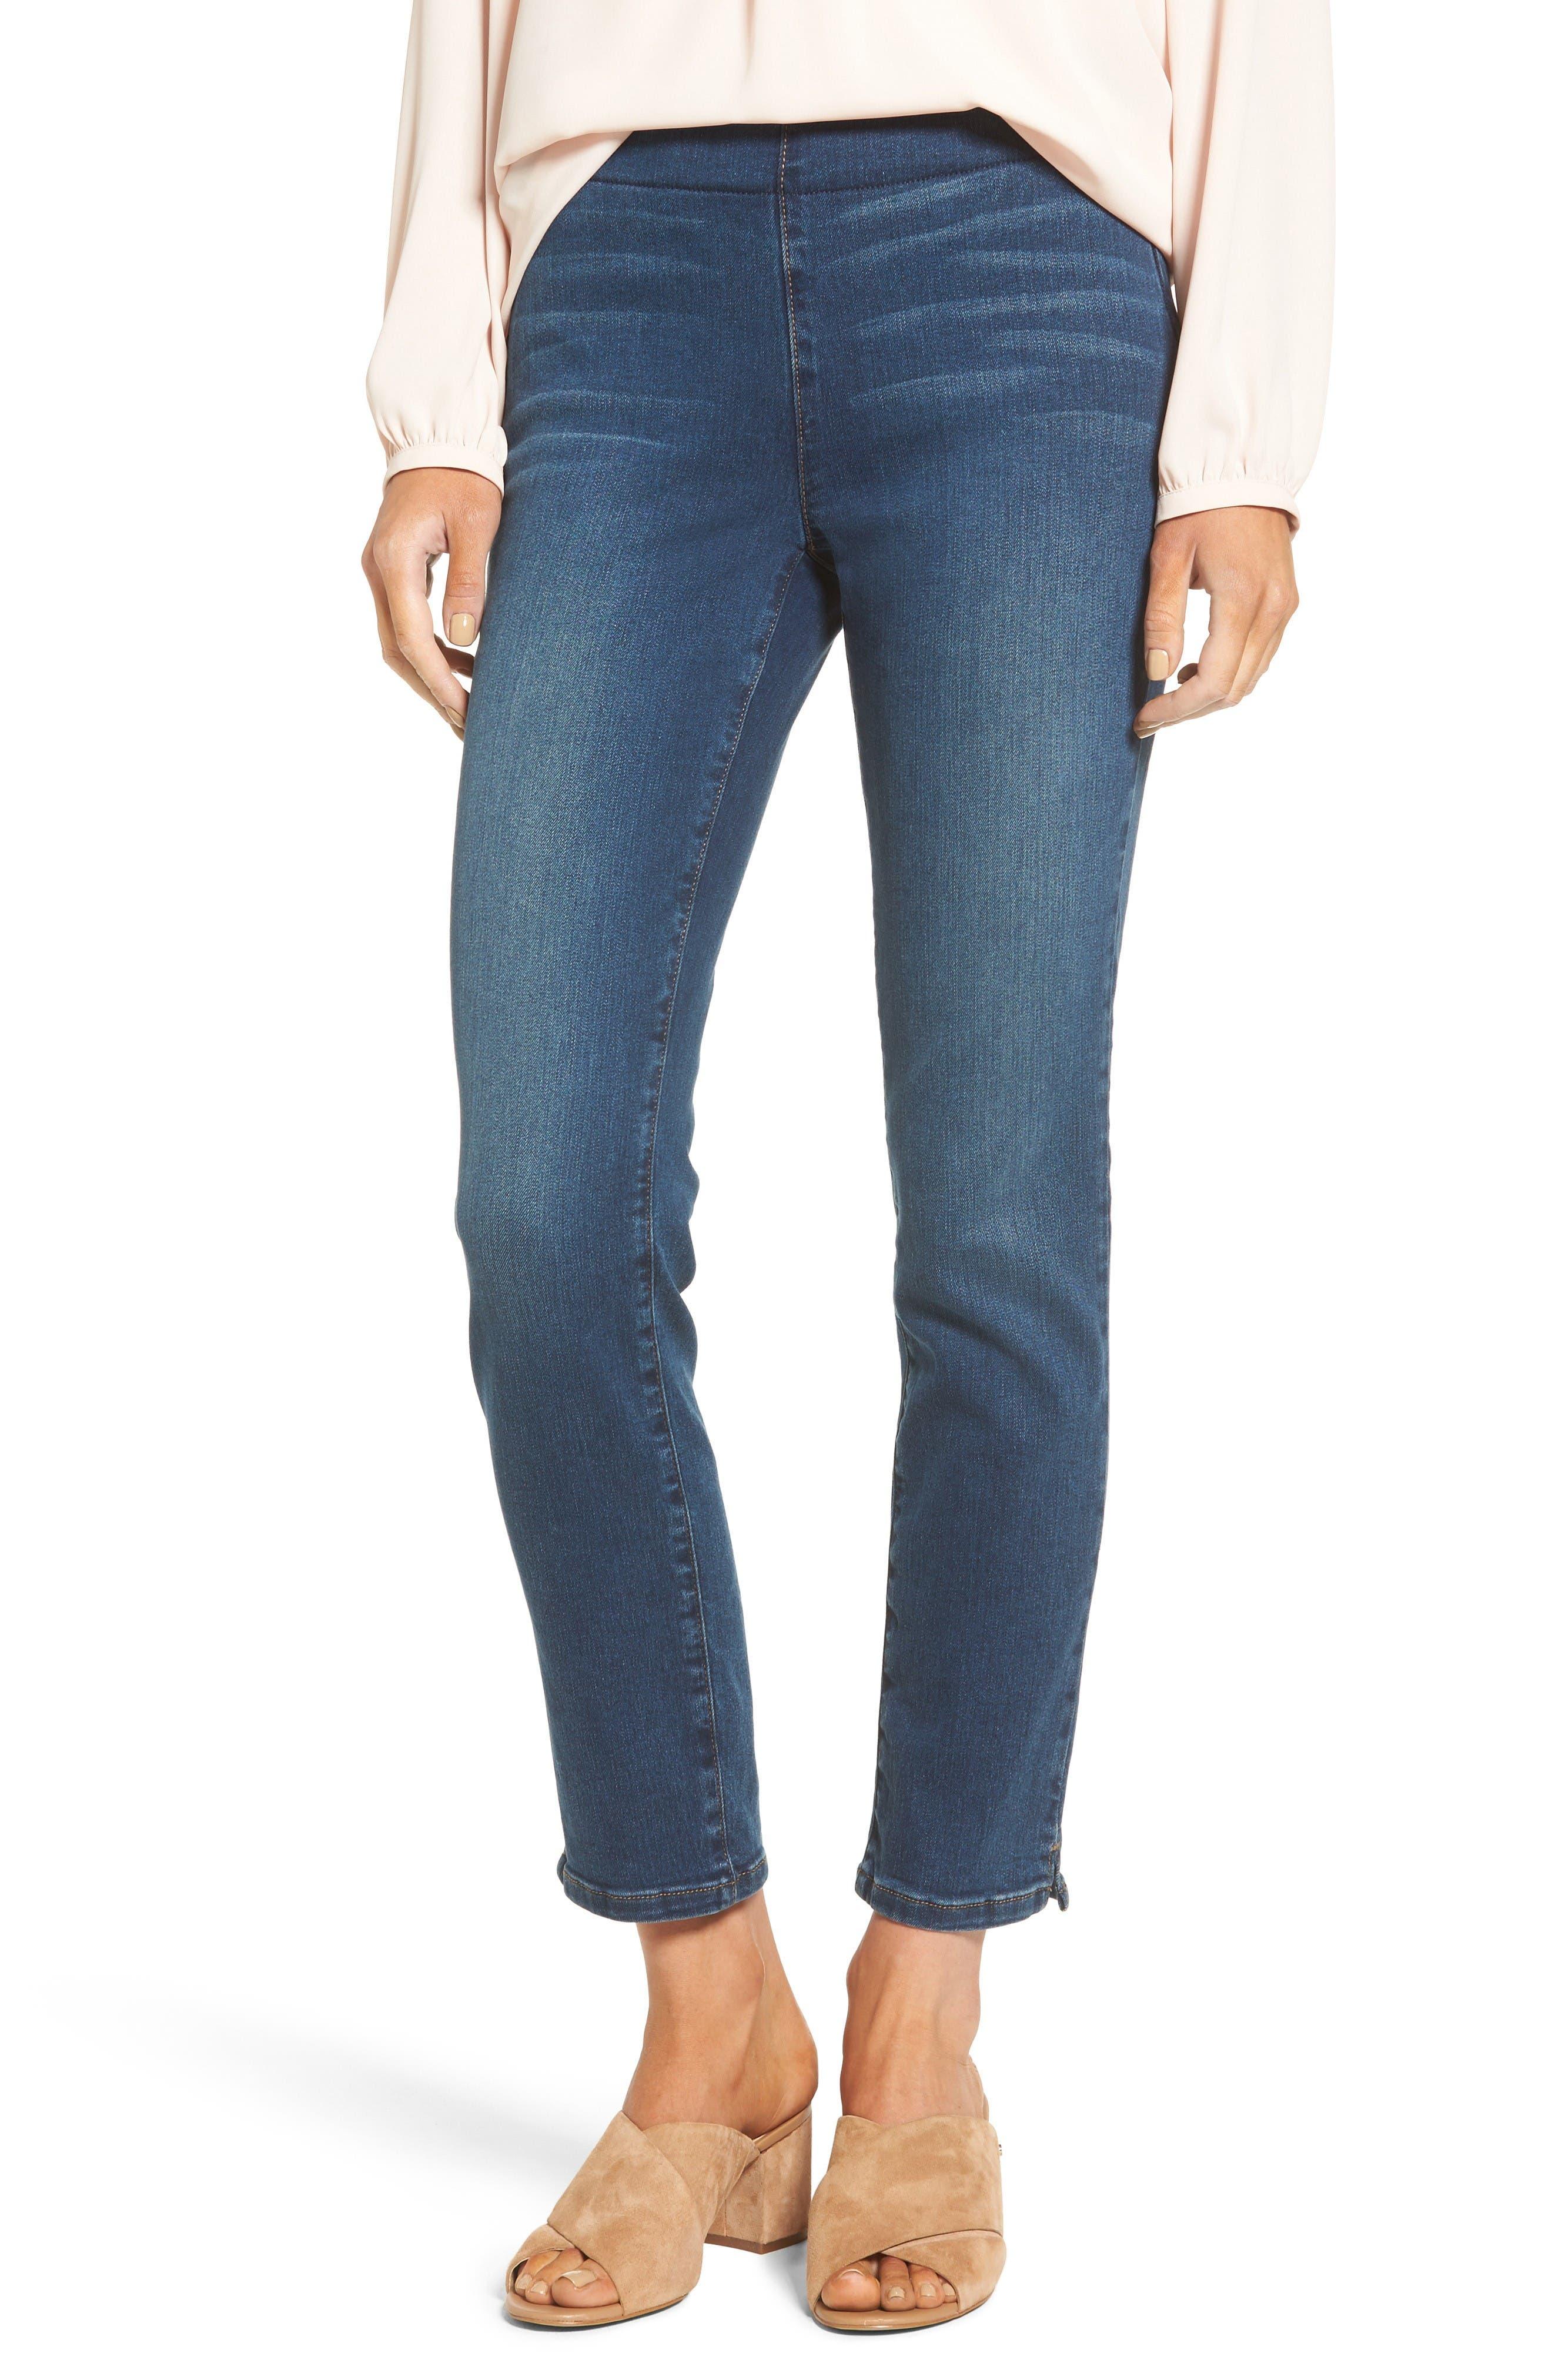 Main Image - NYDJ Alina Pull-On Stretch Ankle Skinny Jeans (Sea Breeze) (Regular & Petite)